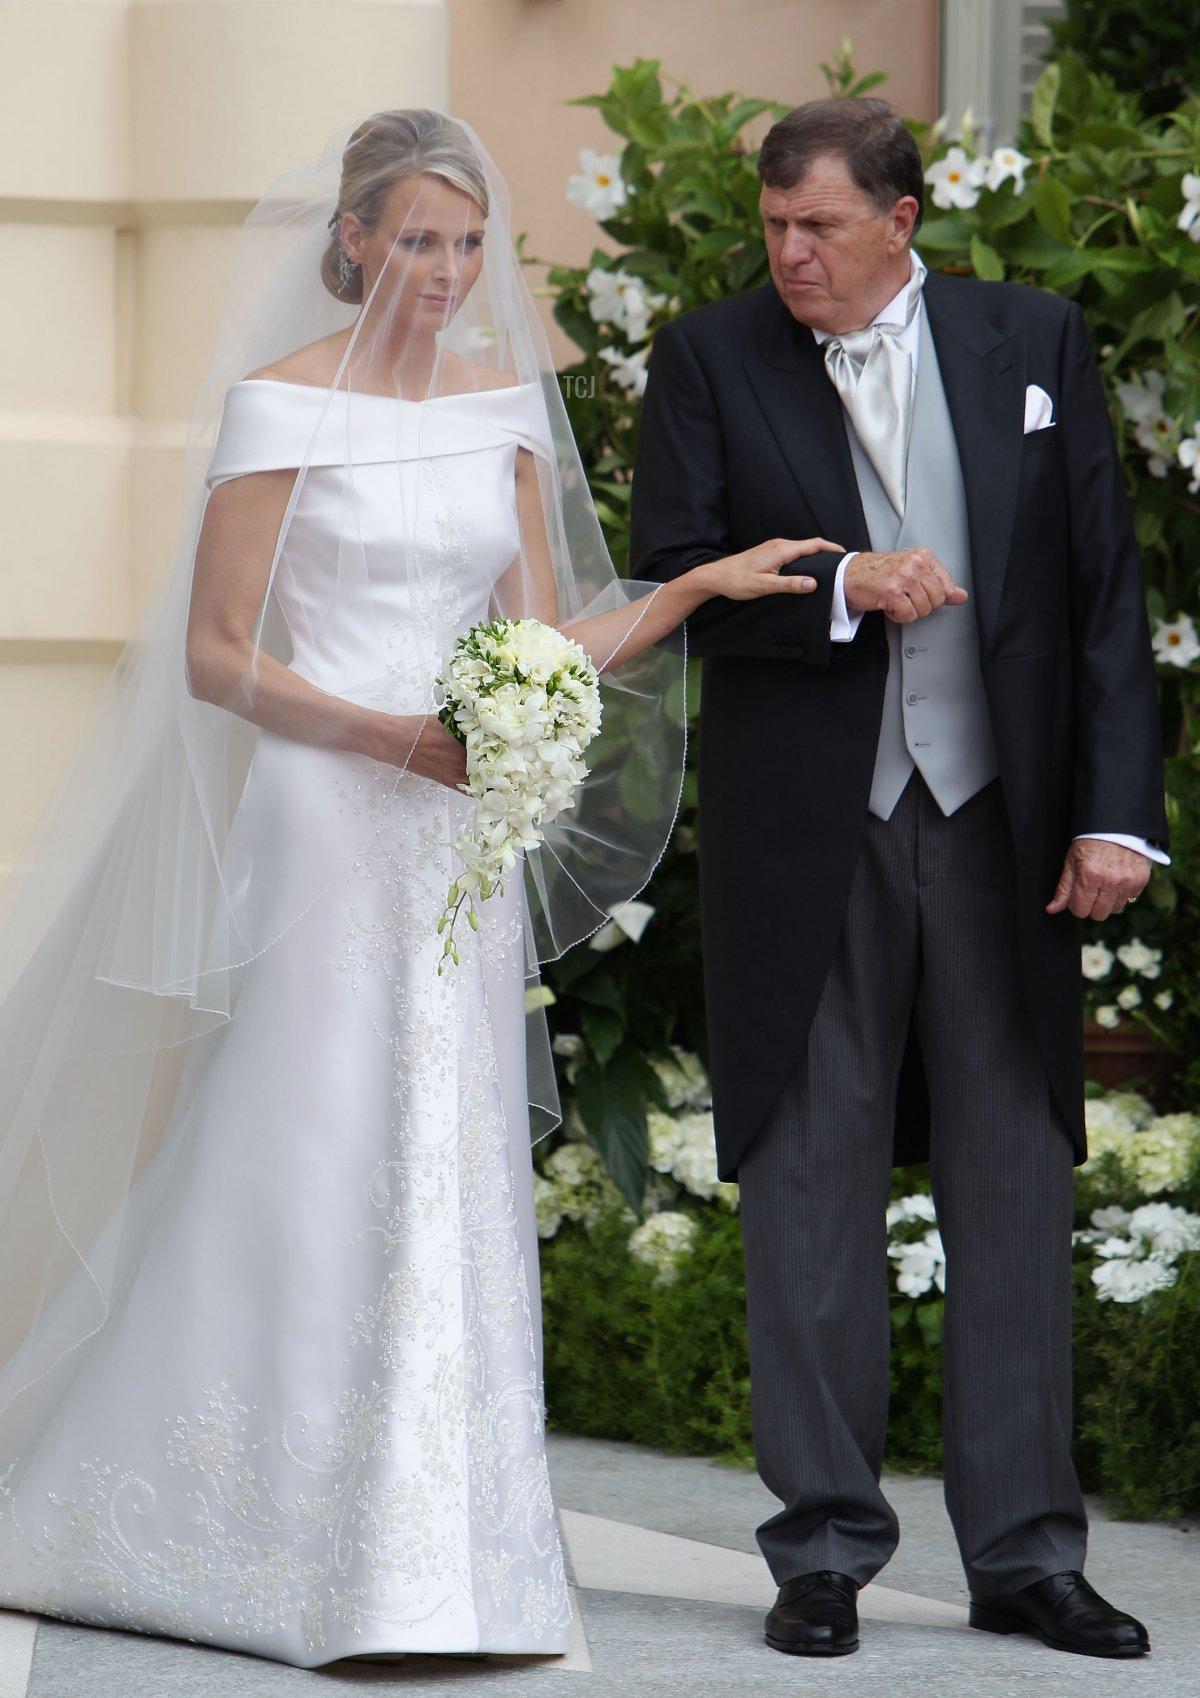 Princess Charlene of Monaco and Michael Kenneth Wittstock arrive at the religious ceremony of the Royal Wedding of Prince Albert II of Monaco to Princess Charlene of Monaco at the Prince's Palace of Monaco on July 2, 2011 in Monaco